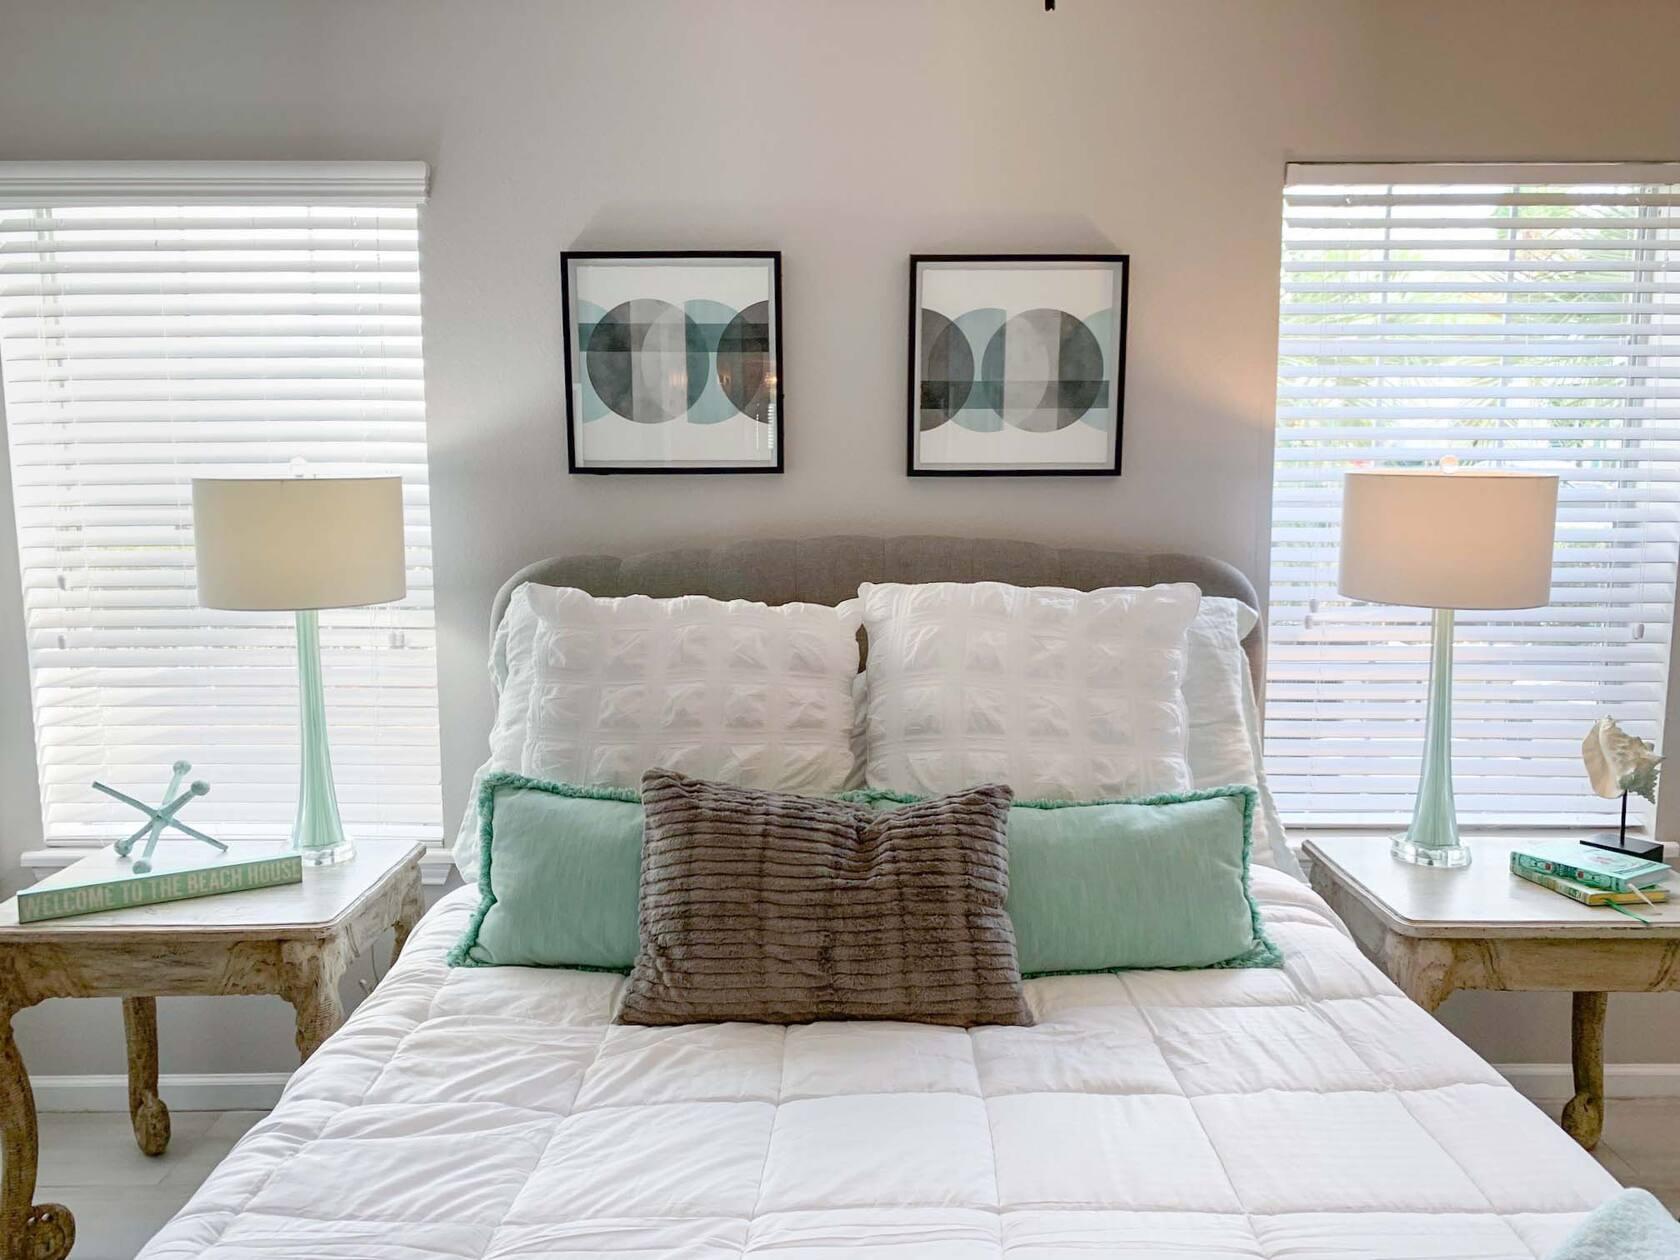 Airbnb Destin FL 2020